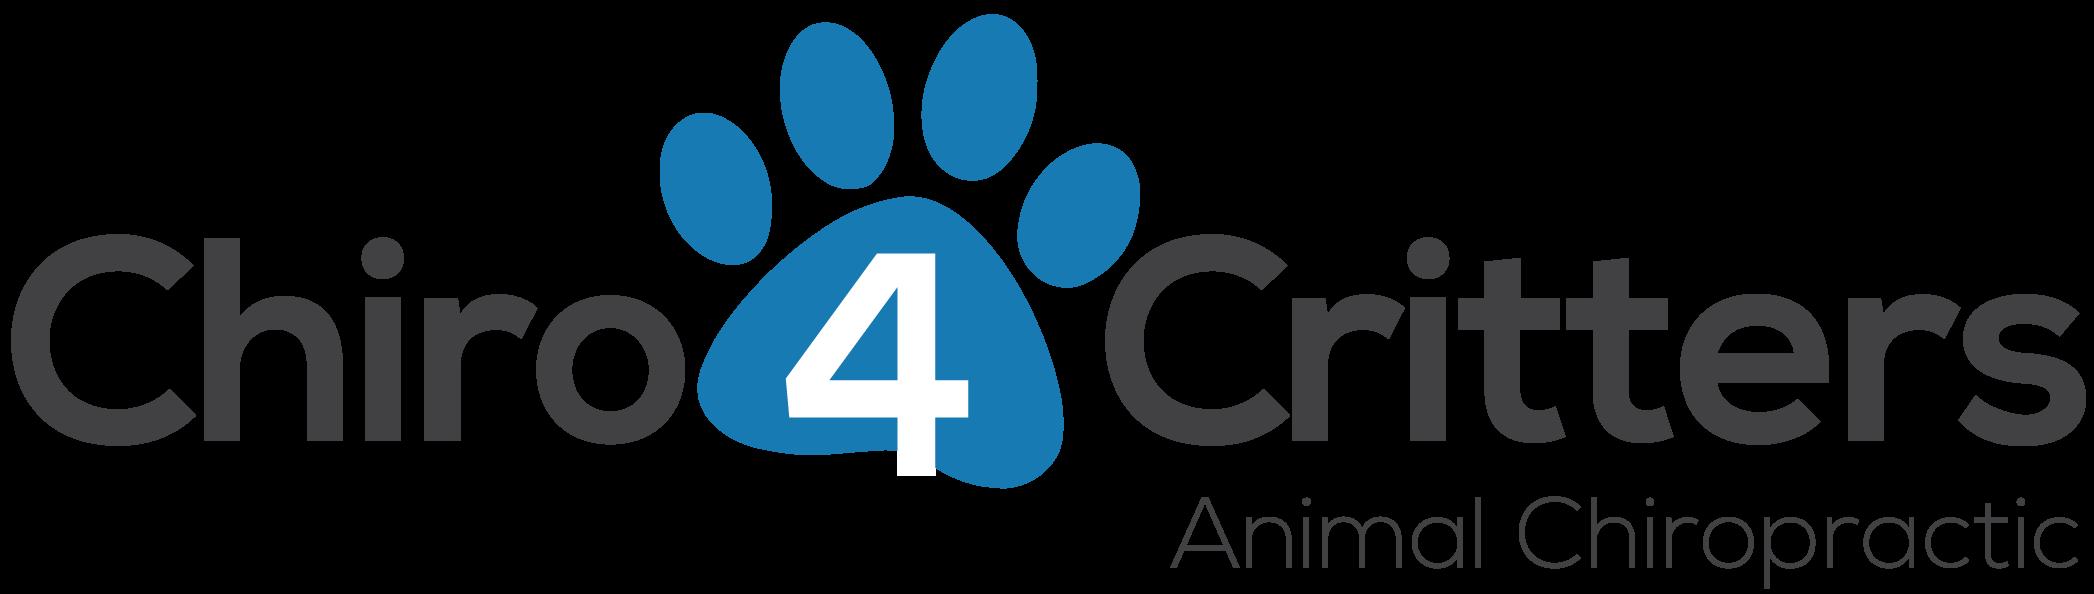 Animal Chiropractor Vancouver WA